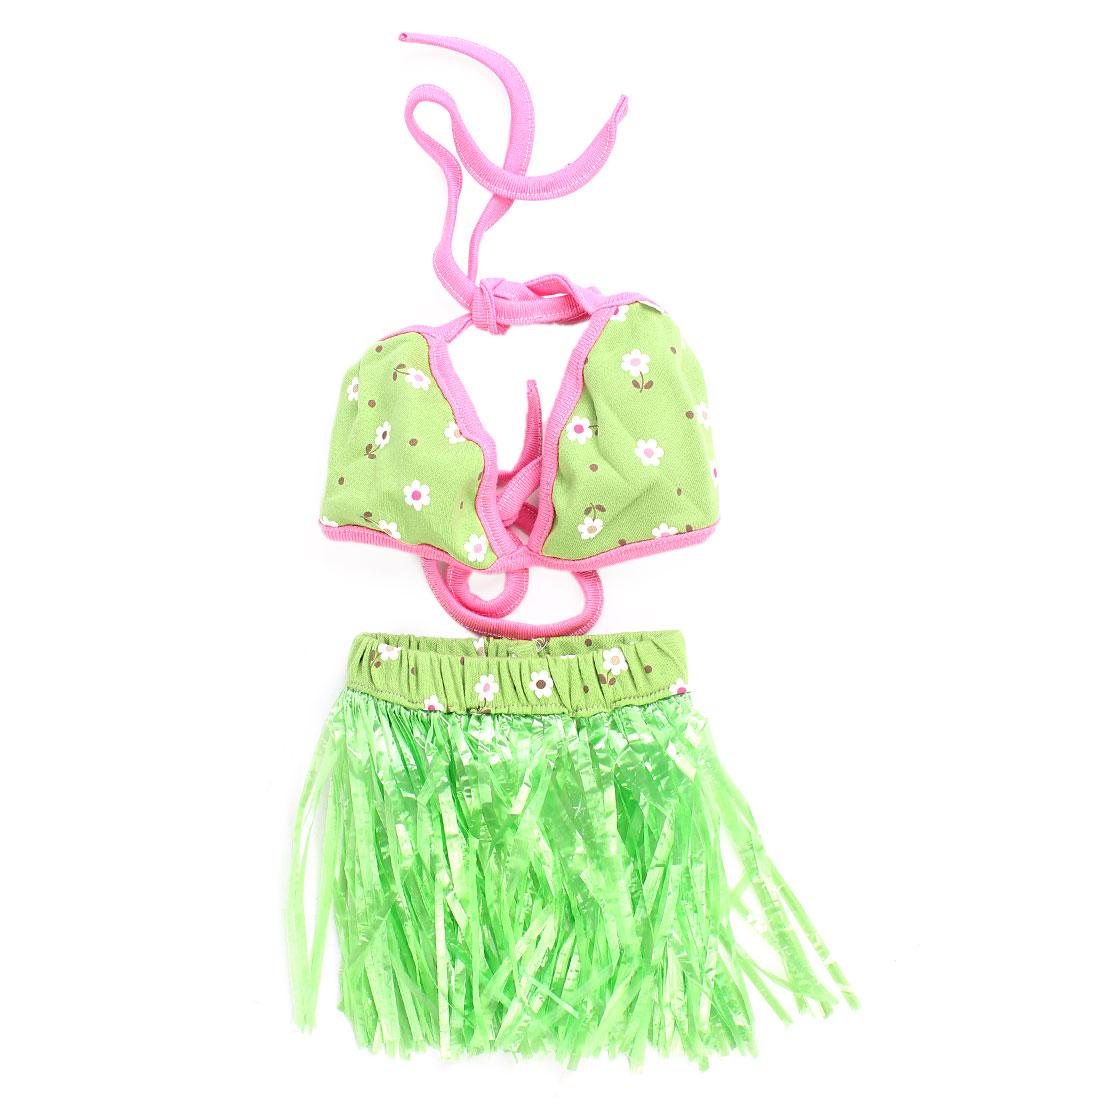 Green Fuchsia Self Tie Pet Dog Puppy Bikini Summer Cool Swim Suit Apparal Skirt Dress Size M